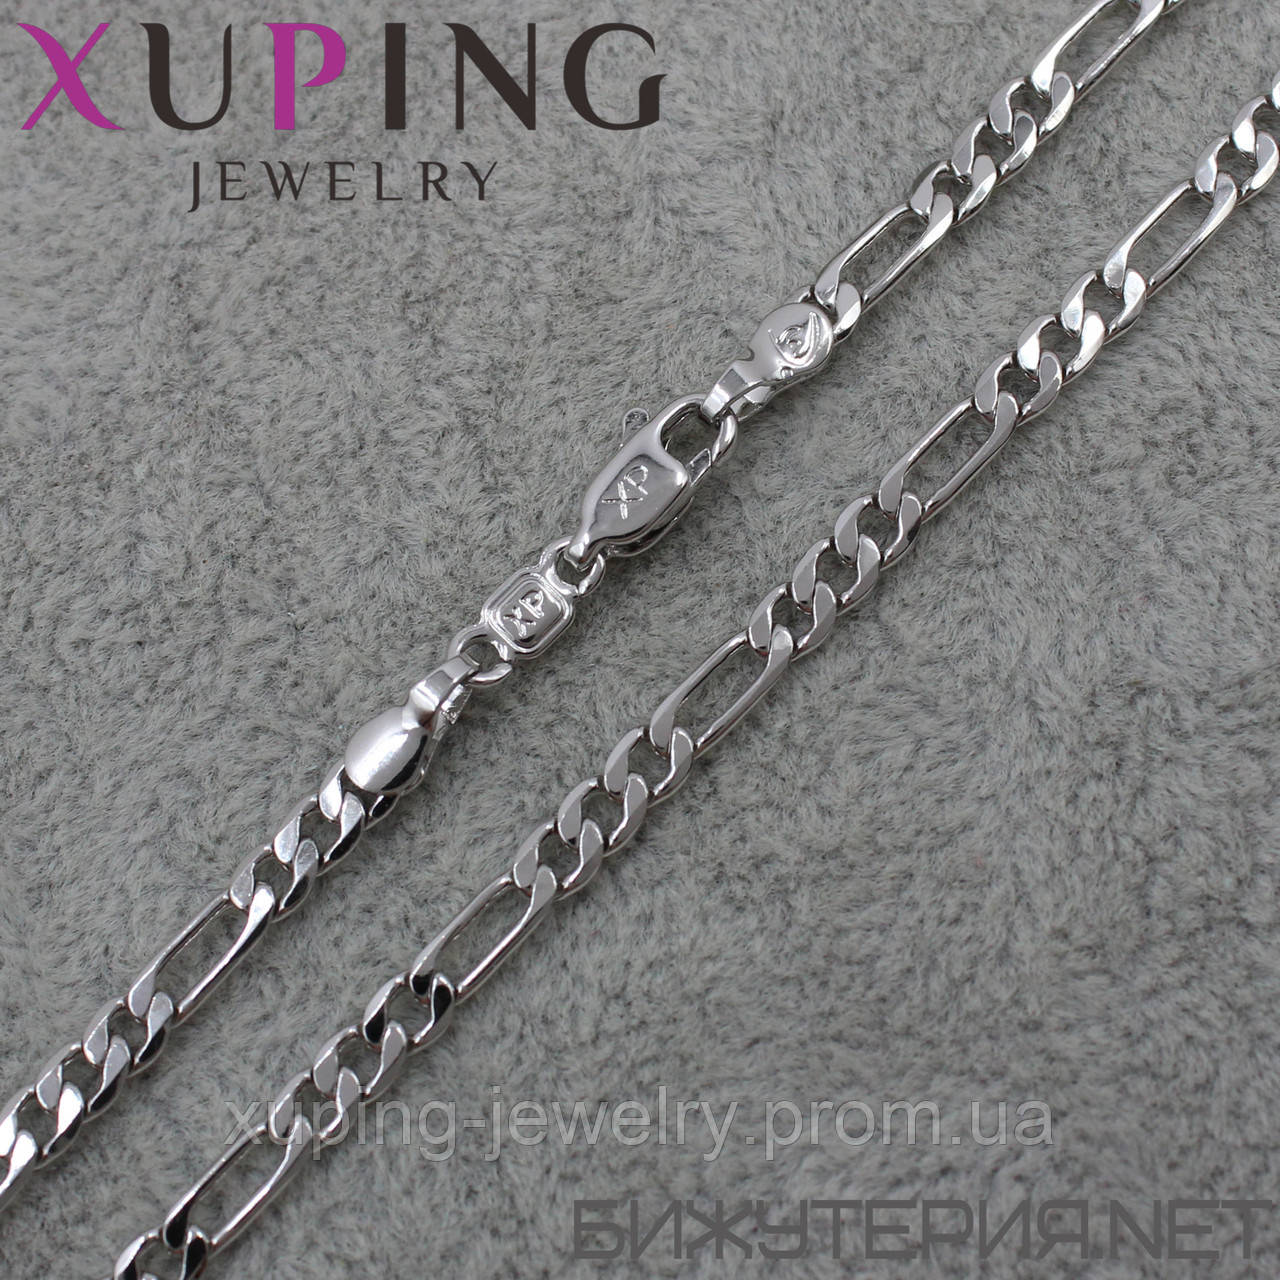 Цепочка Xuping медицинское золото Silver - 1023499827